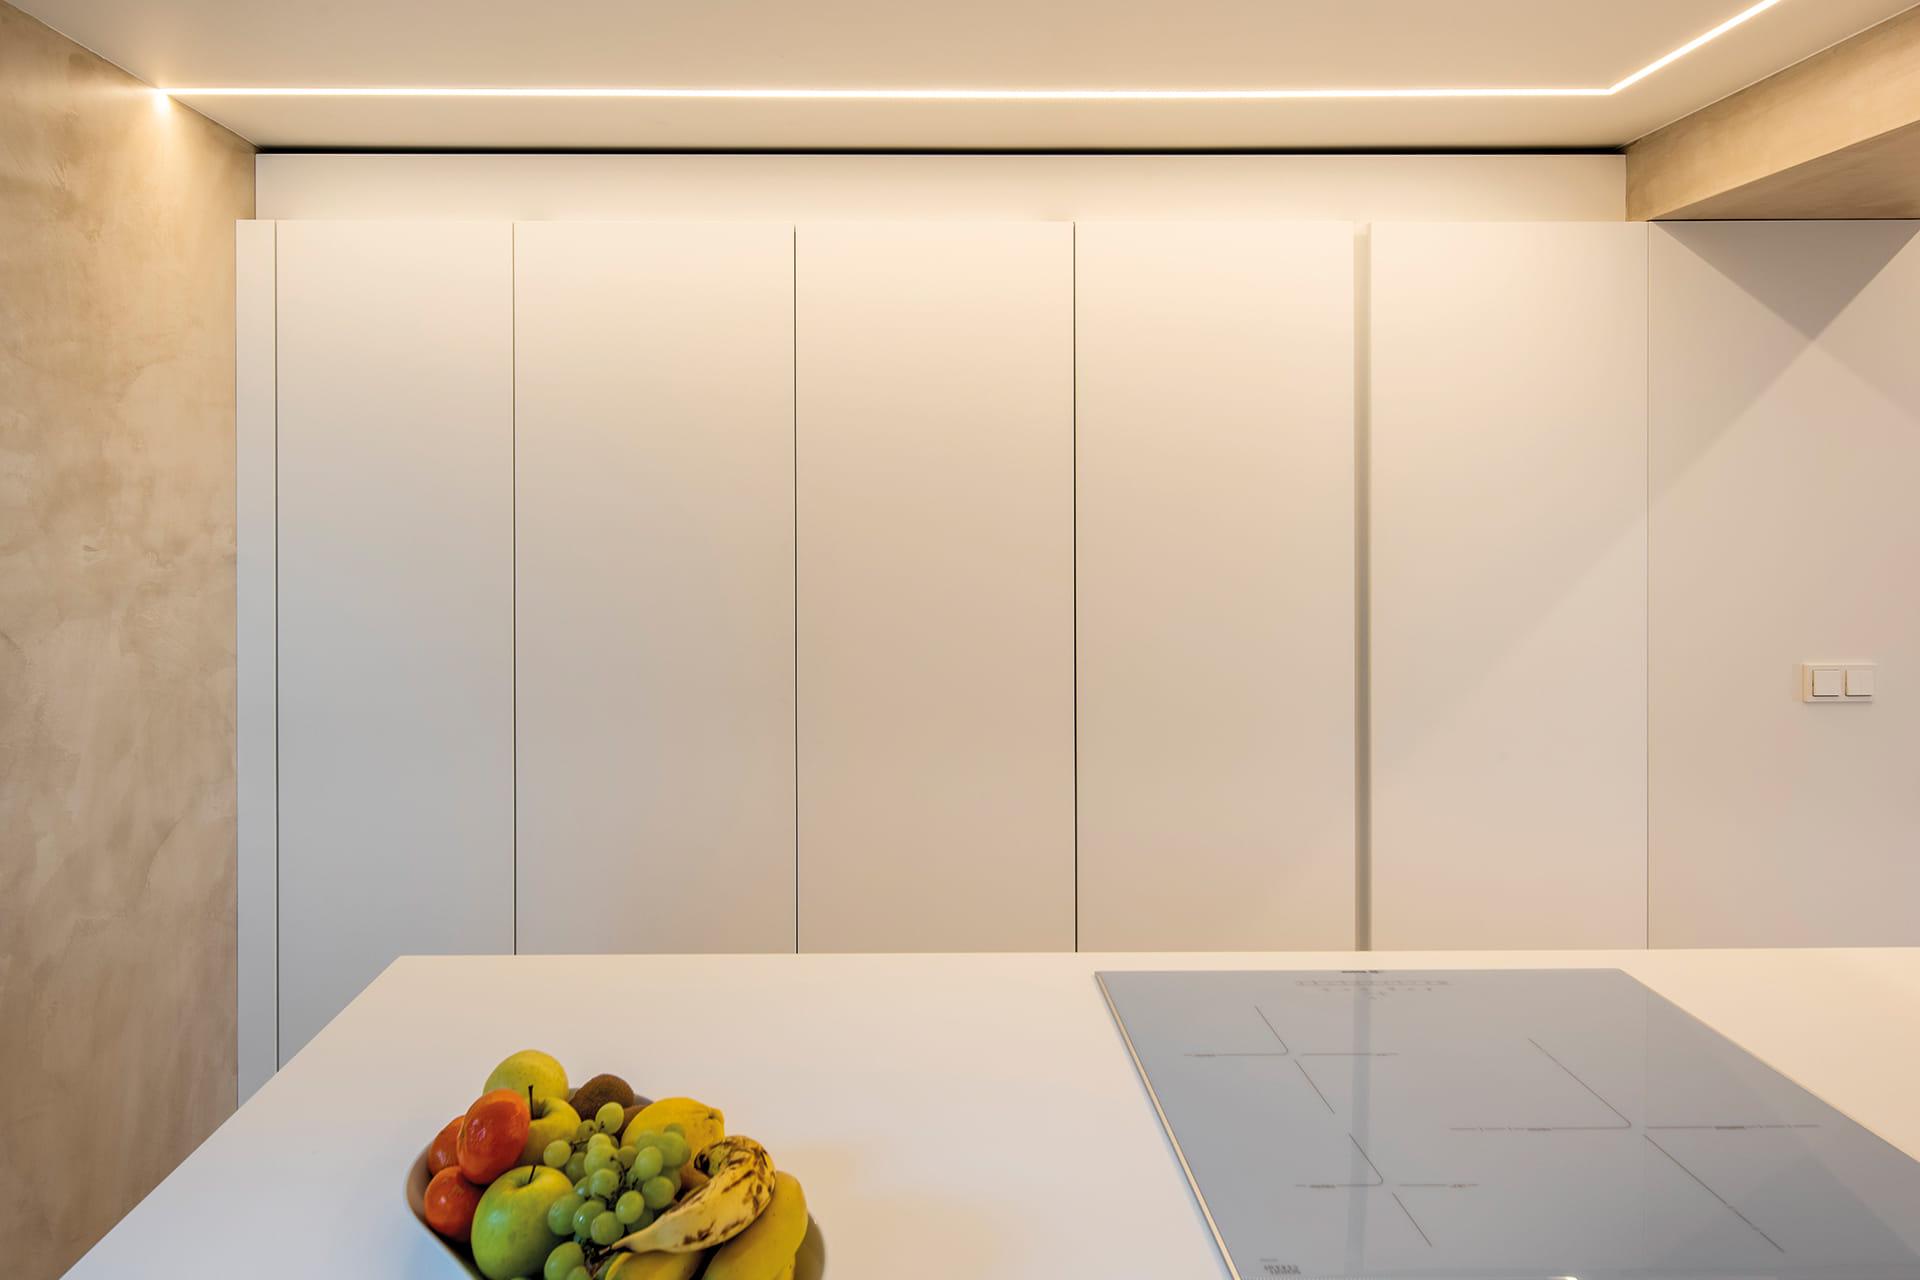 Cocina con lineal de columnas blanco Santos